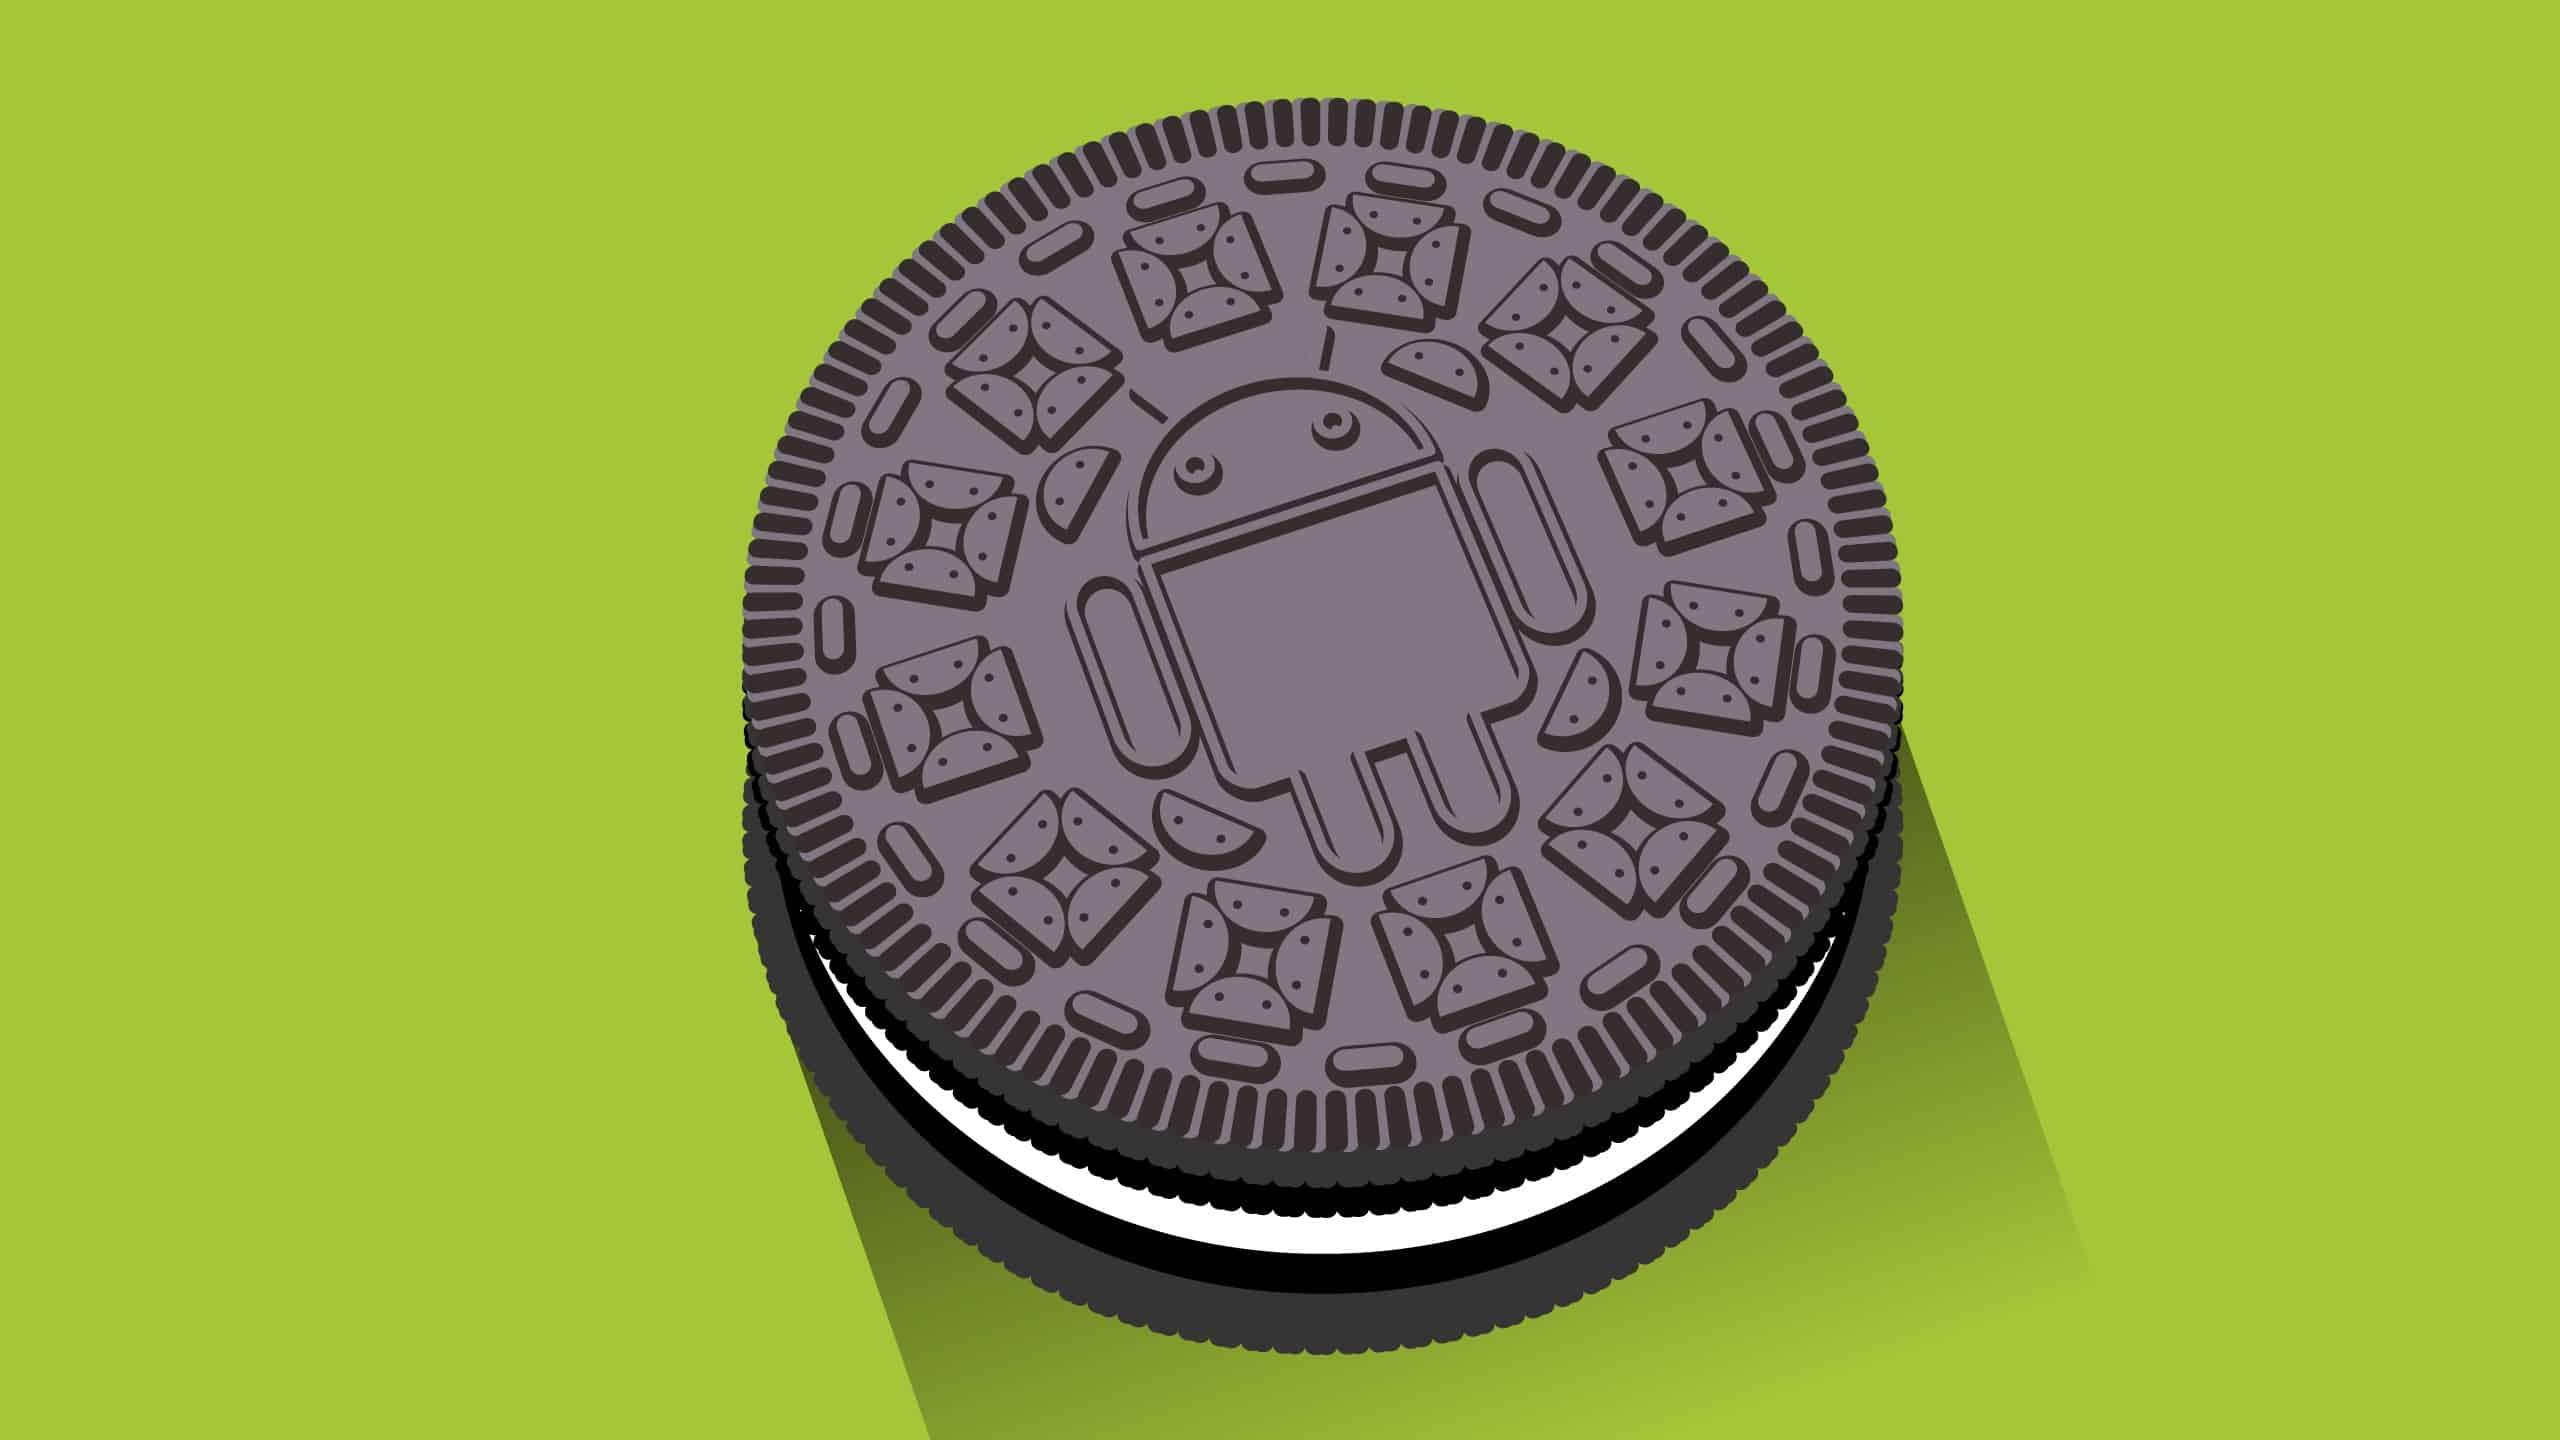 Android : un bogue du NFC permet d'installer des malwares